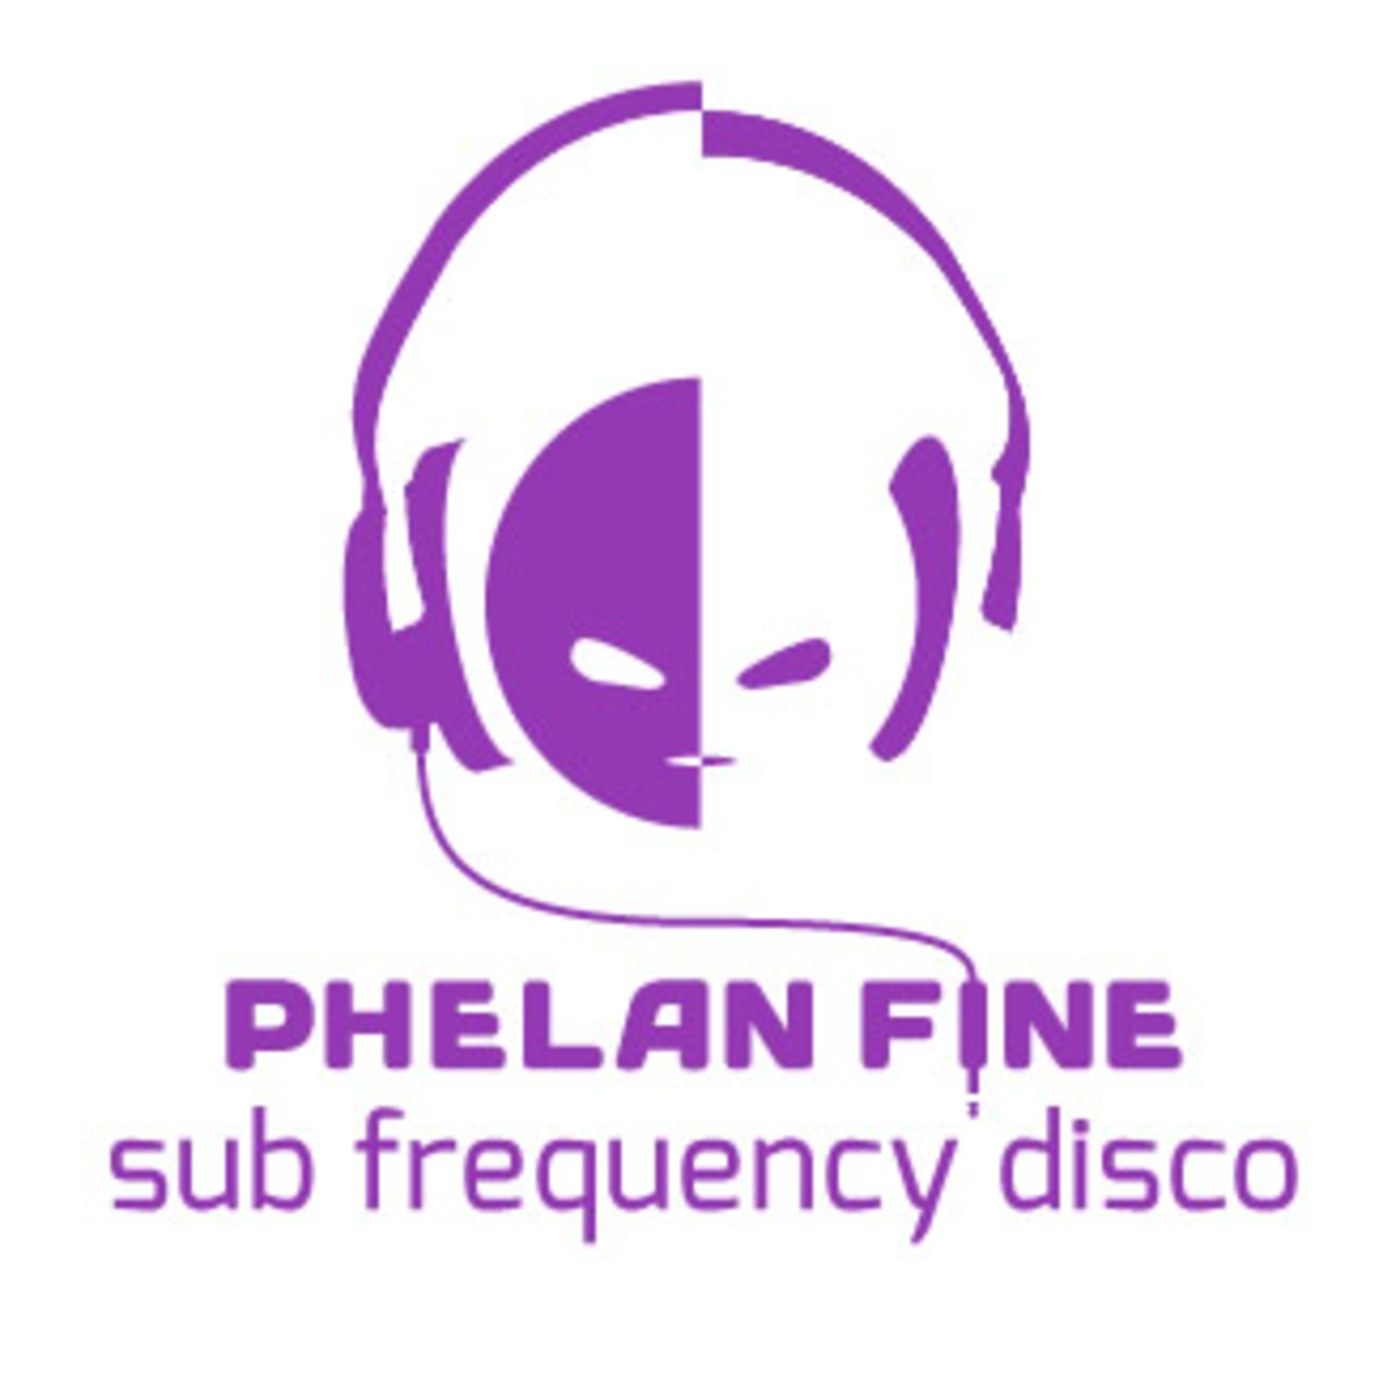 Dj Phelan Fine